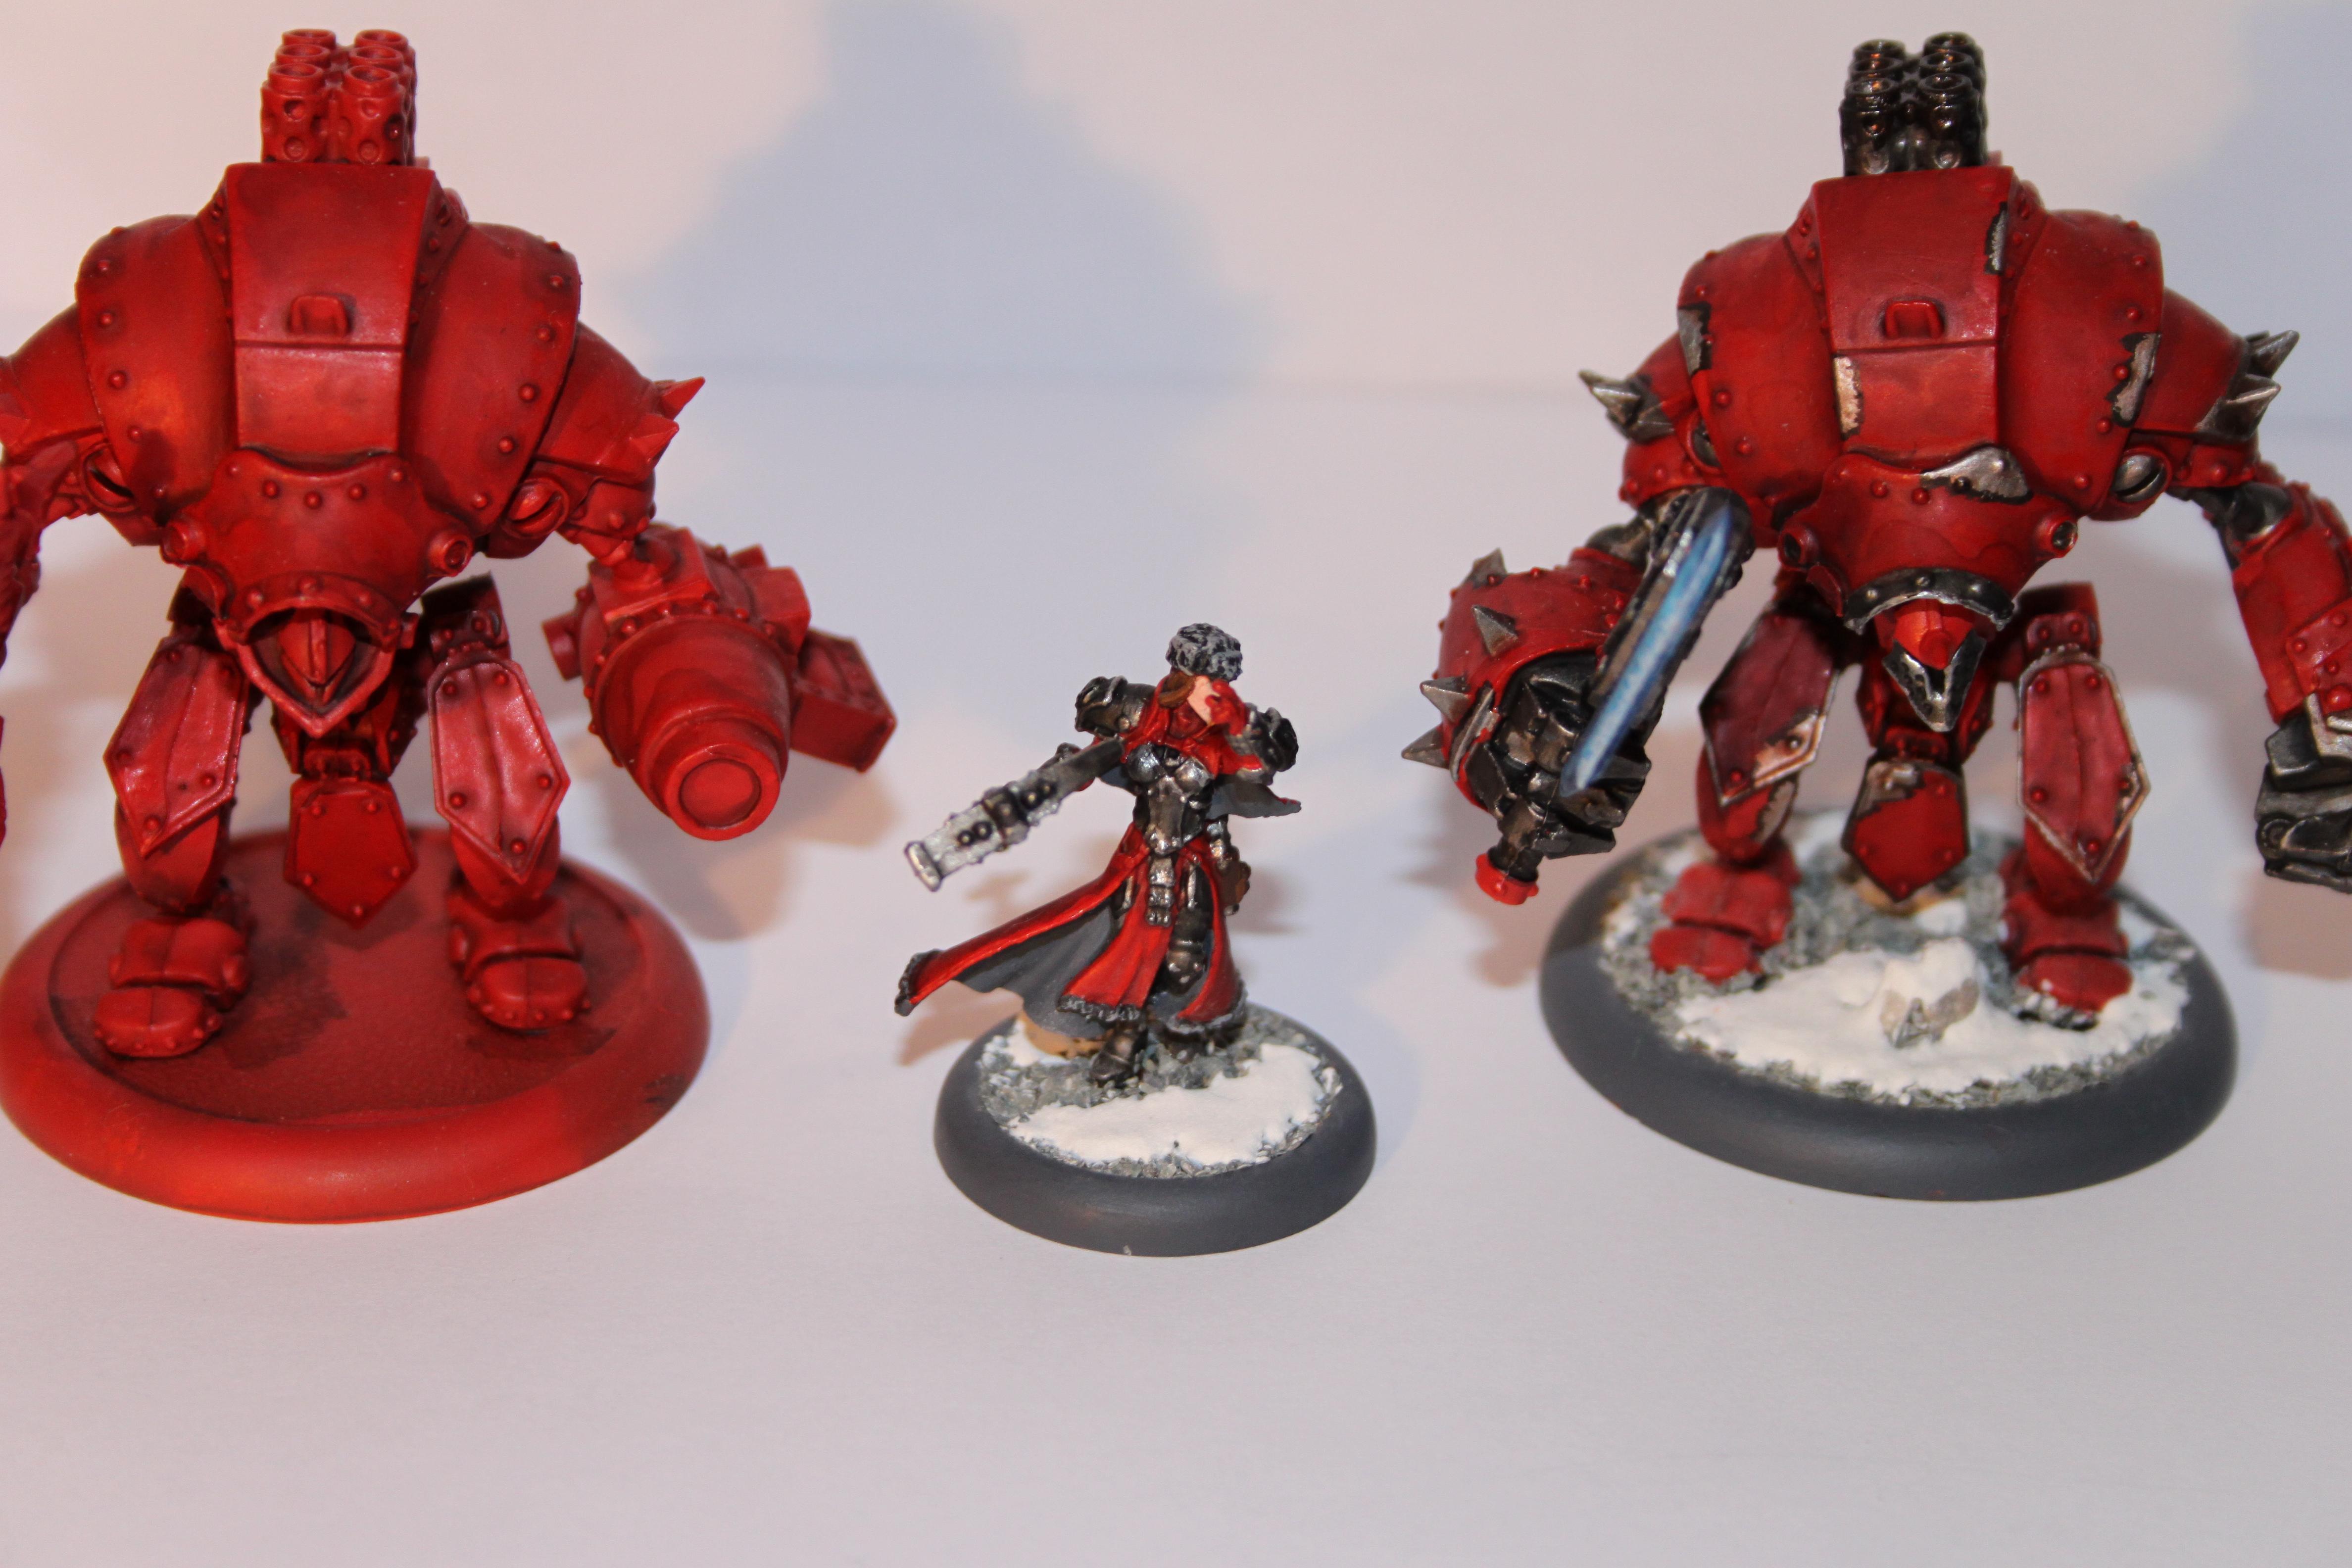 Khador, Red, Snow, Sorscha, Warmachine